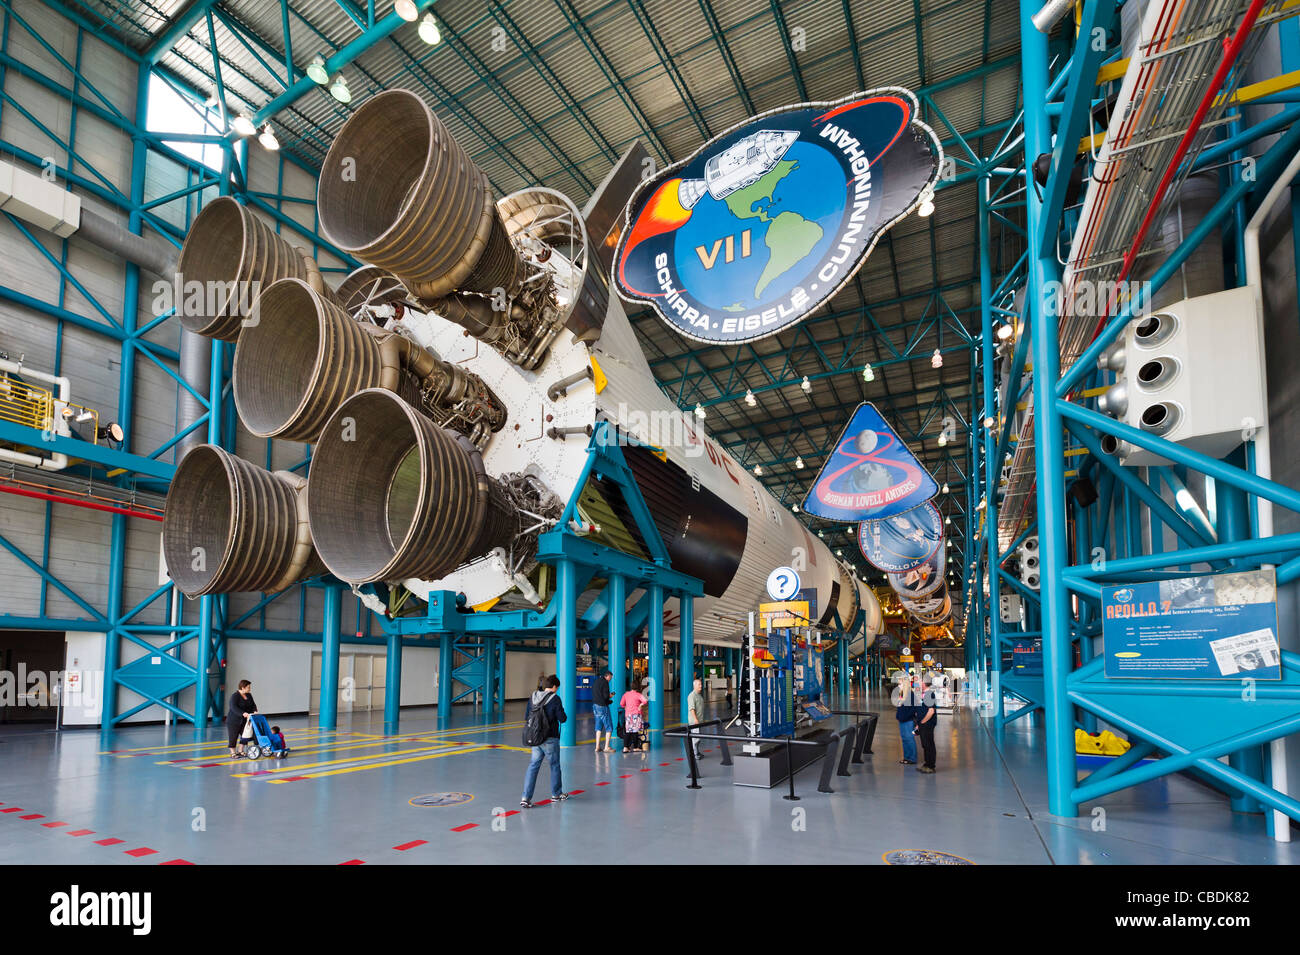 Saturn V rocket from the Apollo moon program, Saturn V complex, Kennedy Space Center, Merritt Island, Florida, USA - Stock Image